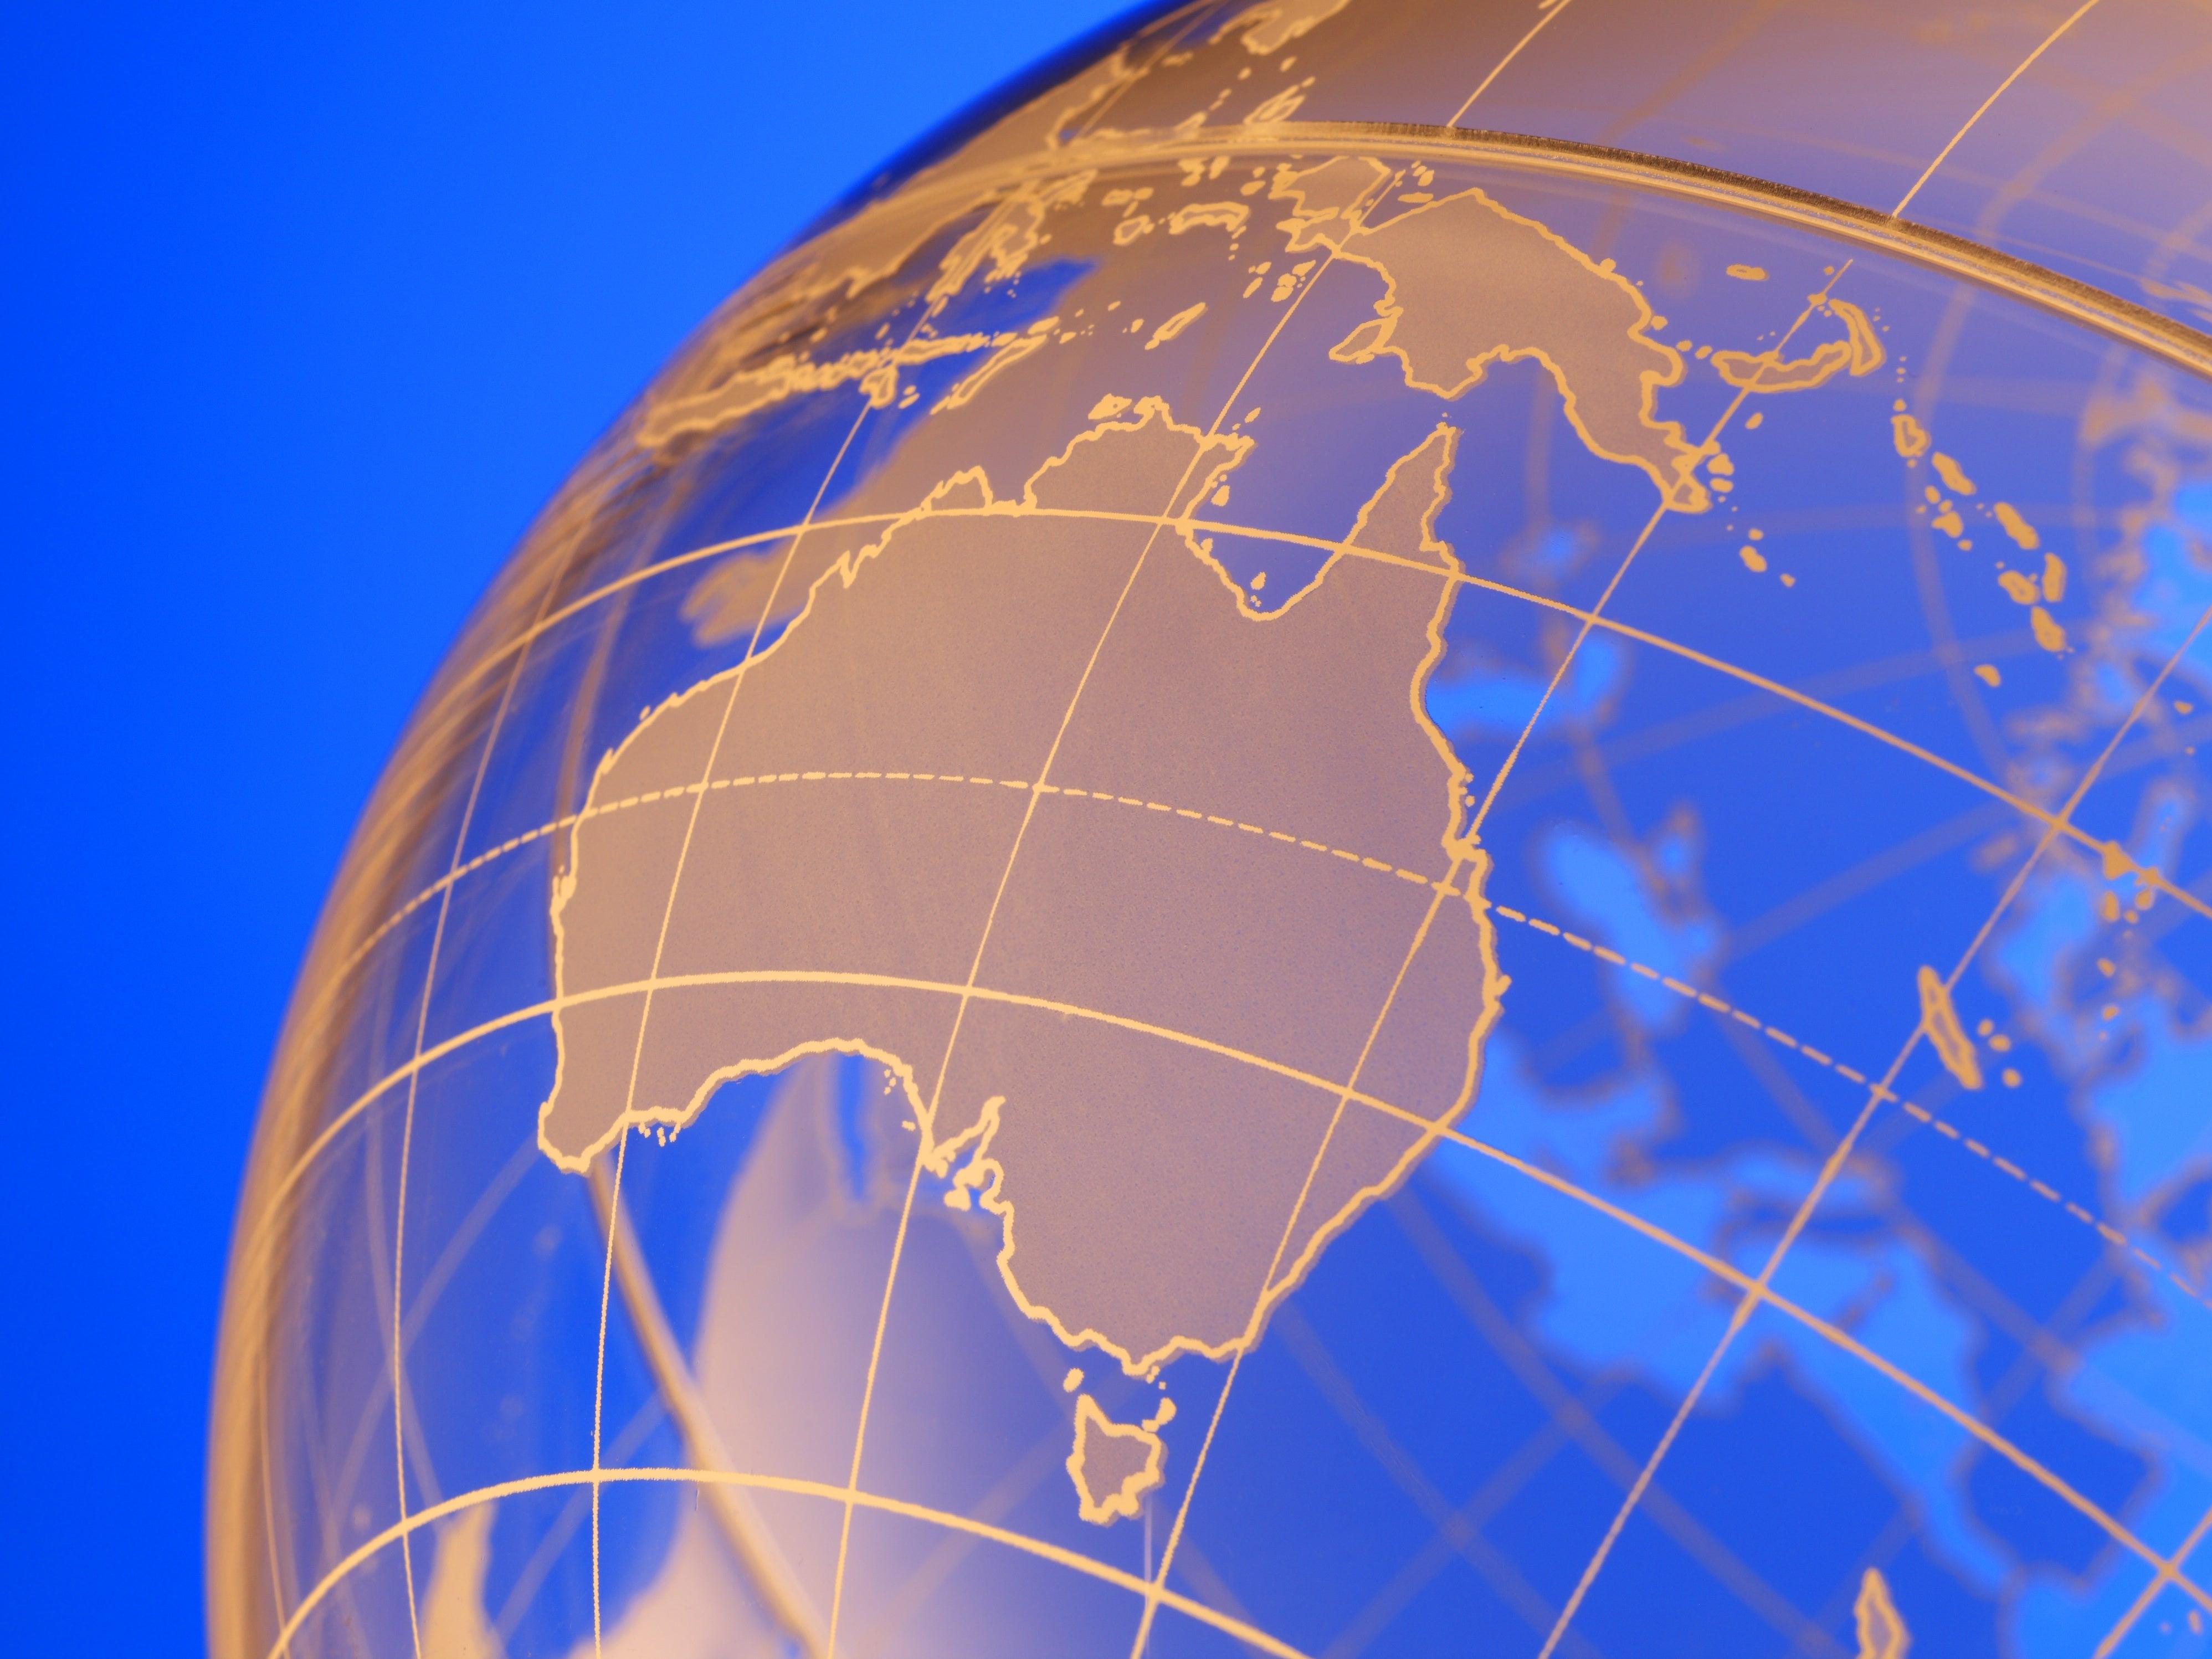 Australia struggles to improve global corruption perception ranking